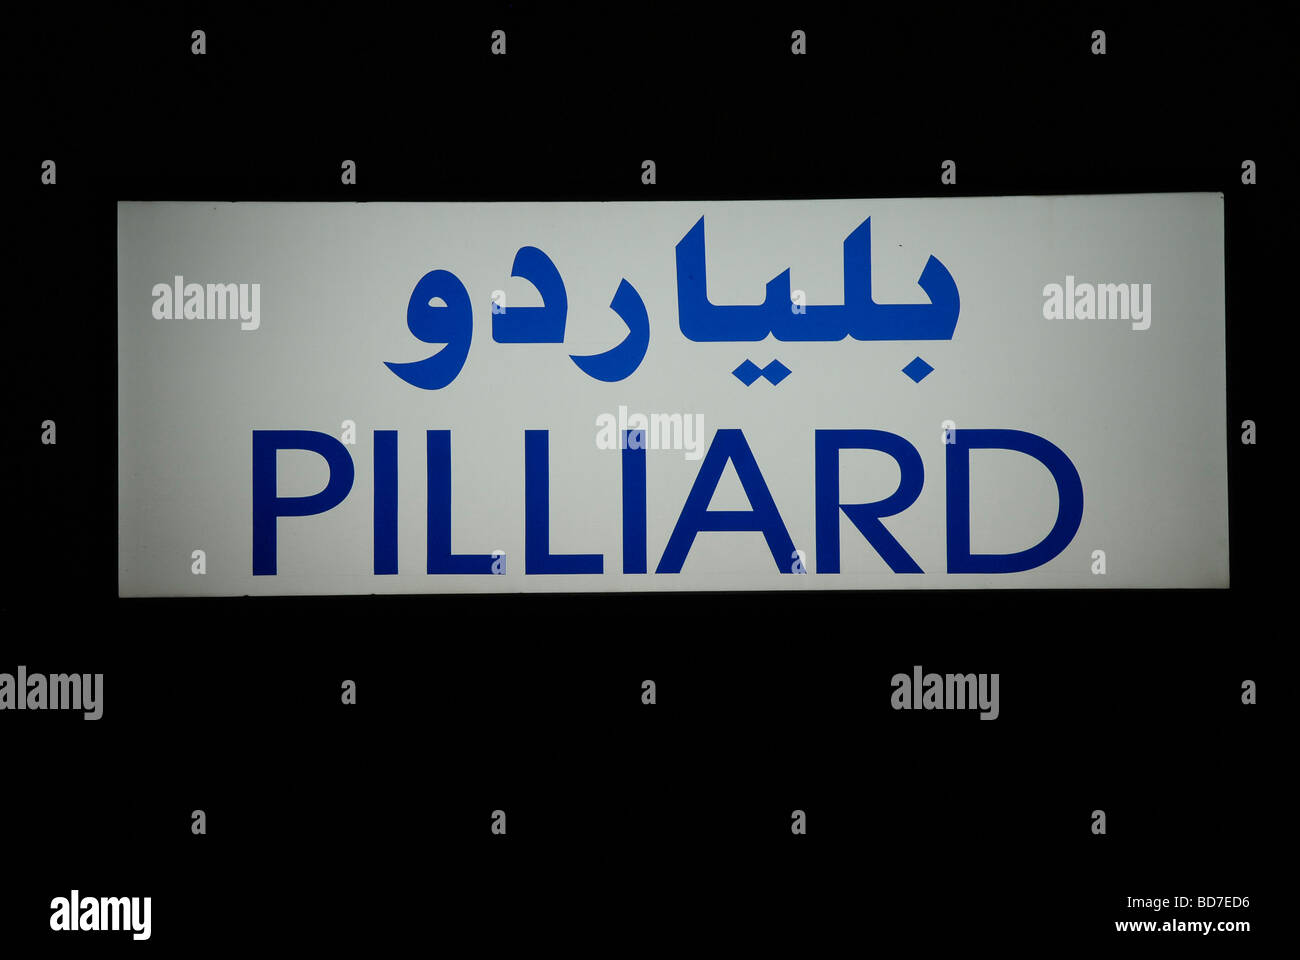 Pool billiard sign in Arabic and mis-spelt English in Amman Jordan - Stock Image